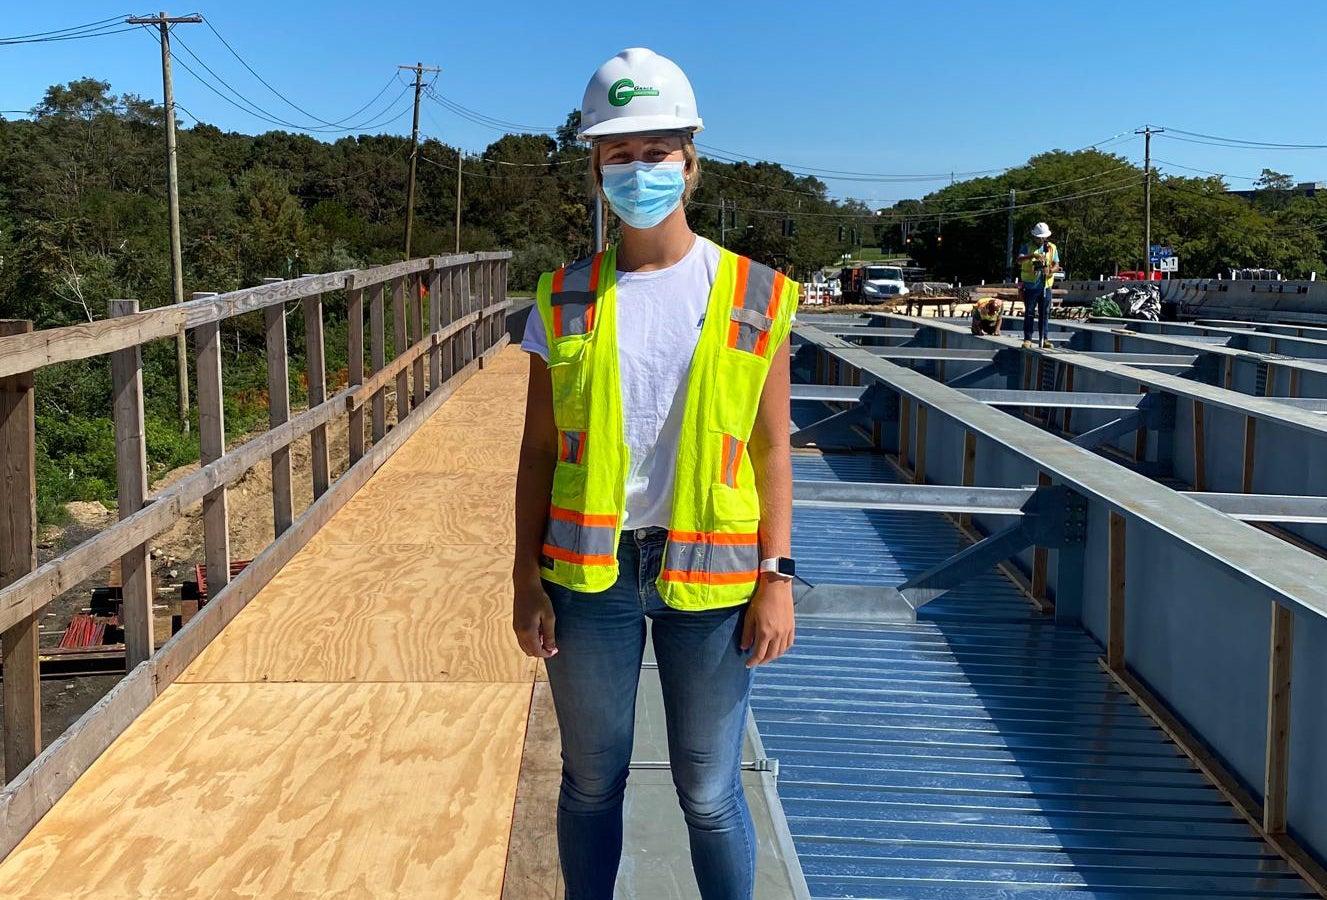 Engineering major Natalie Wilcox on Walt Whitman Bridge